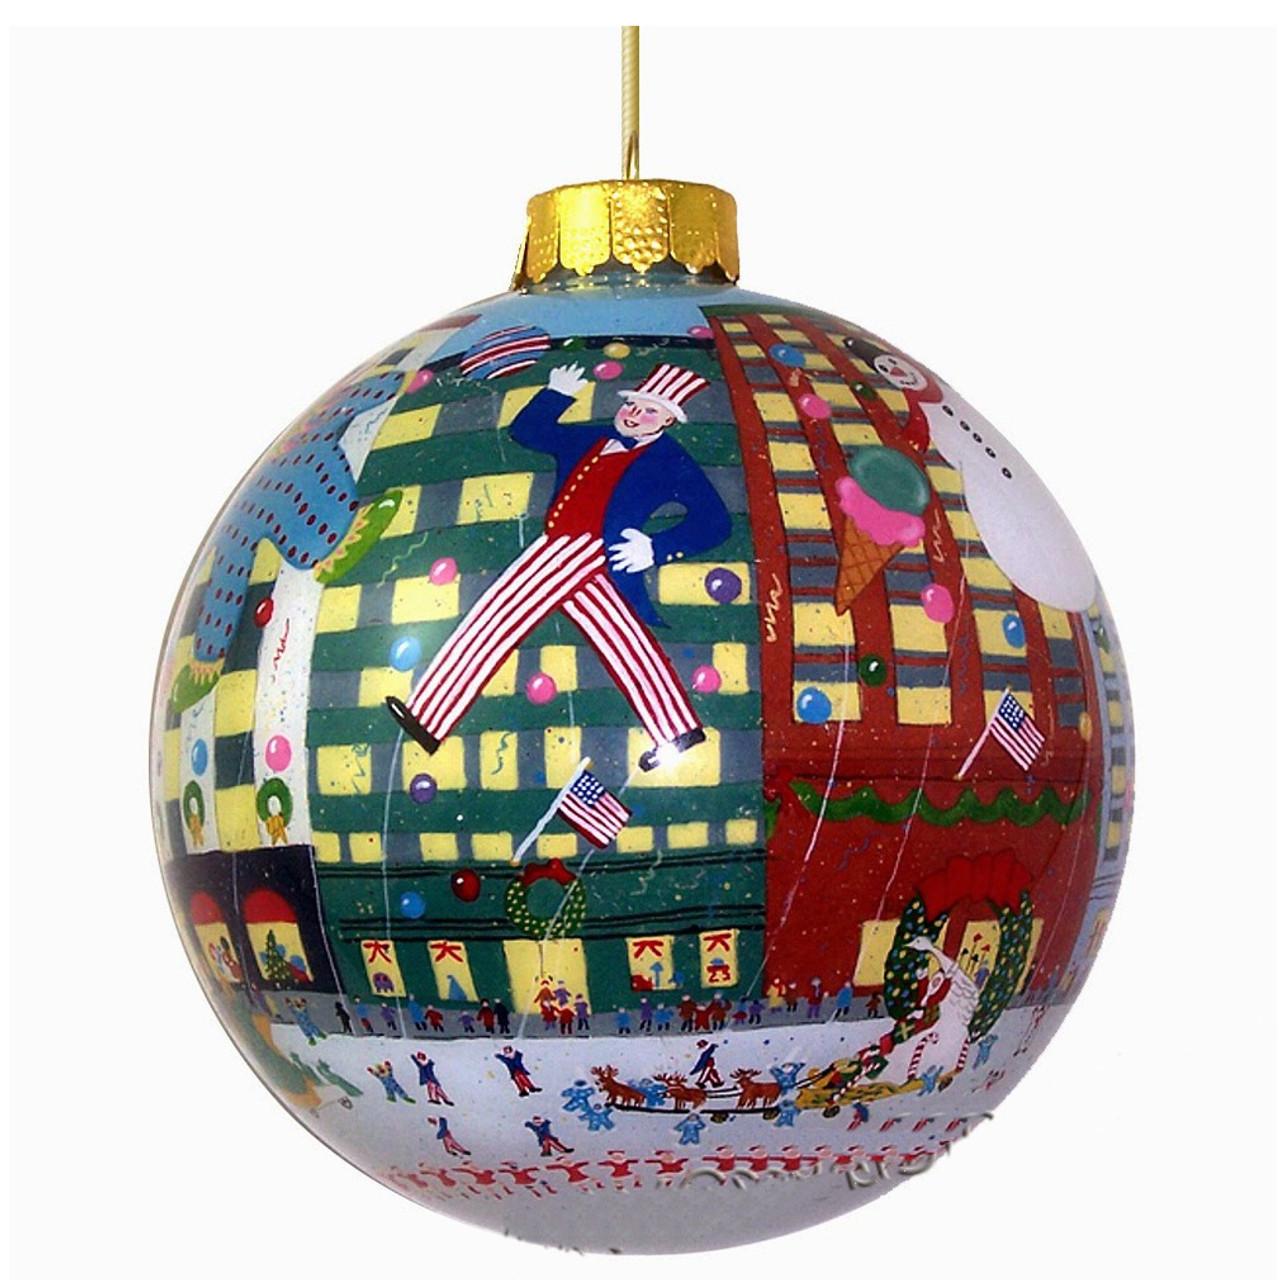 NYC Holiday Parade Glass Ball Ornament